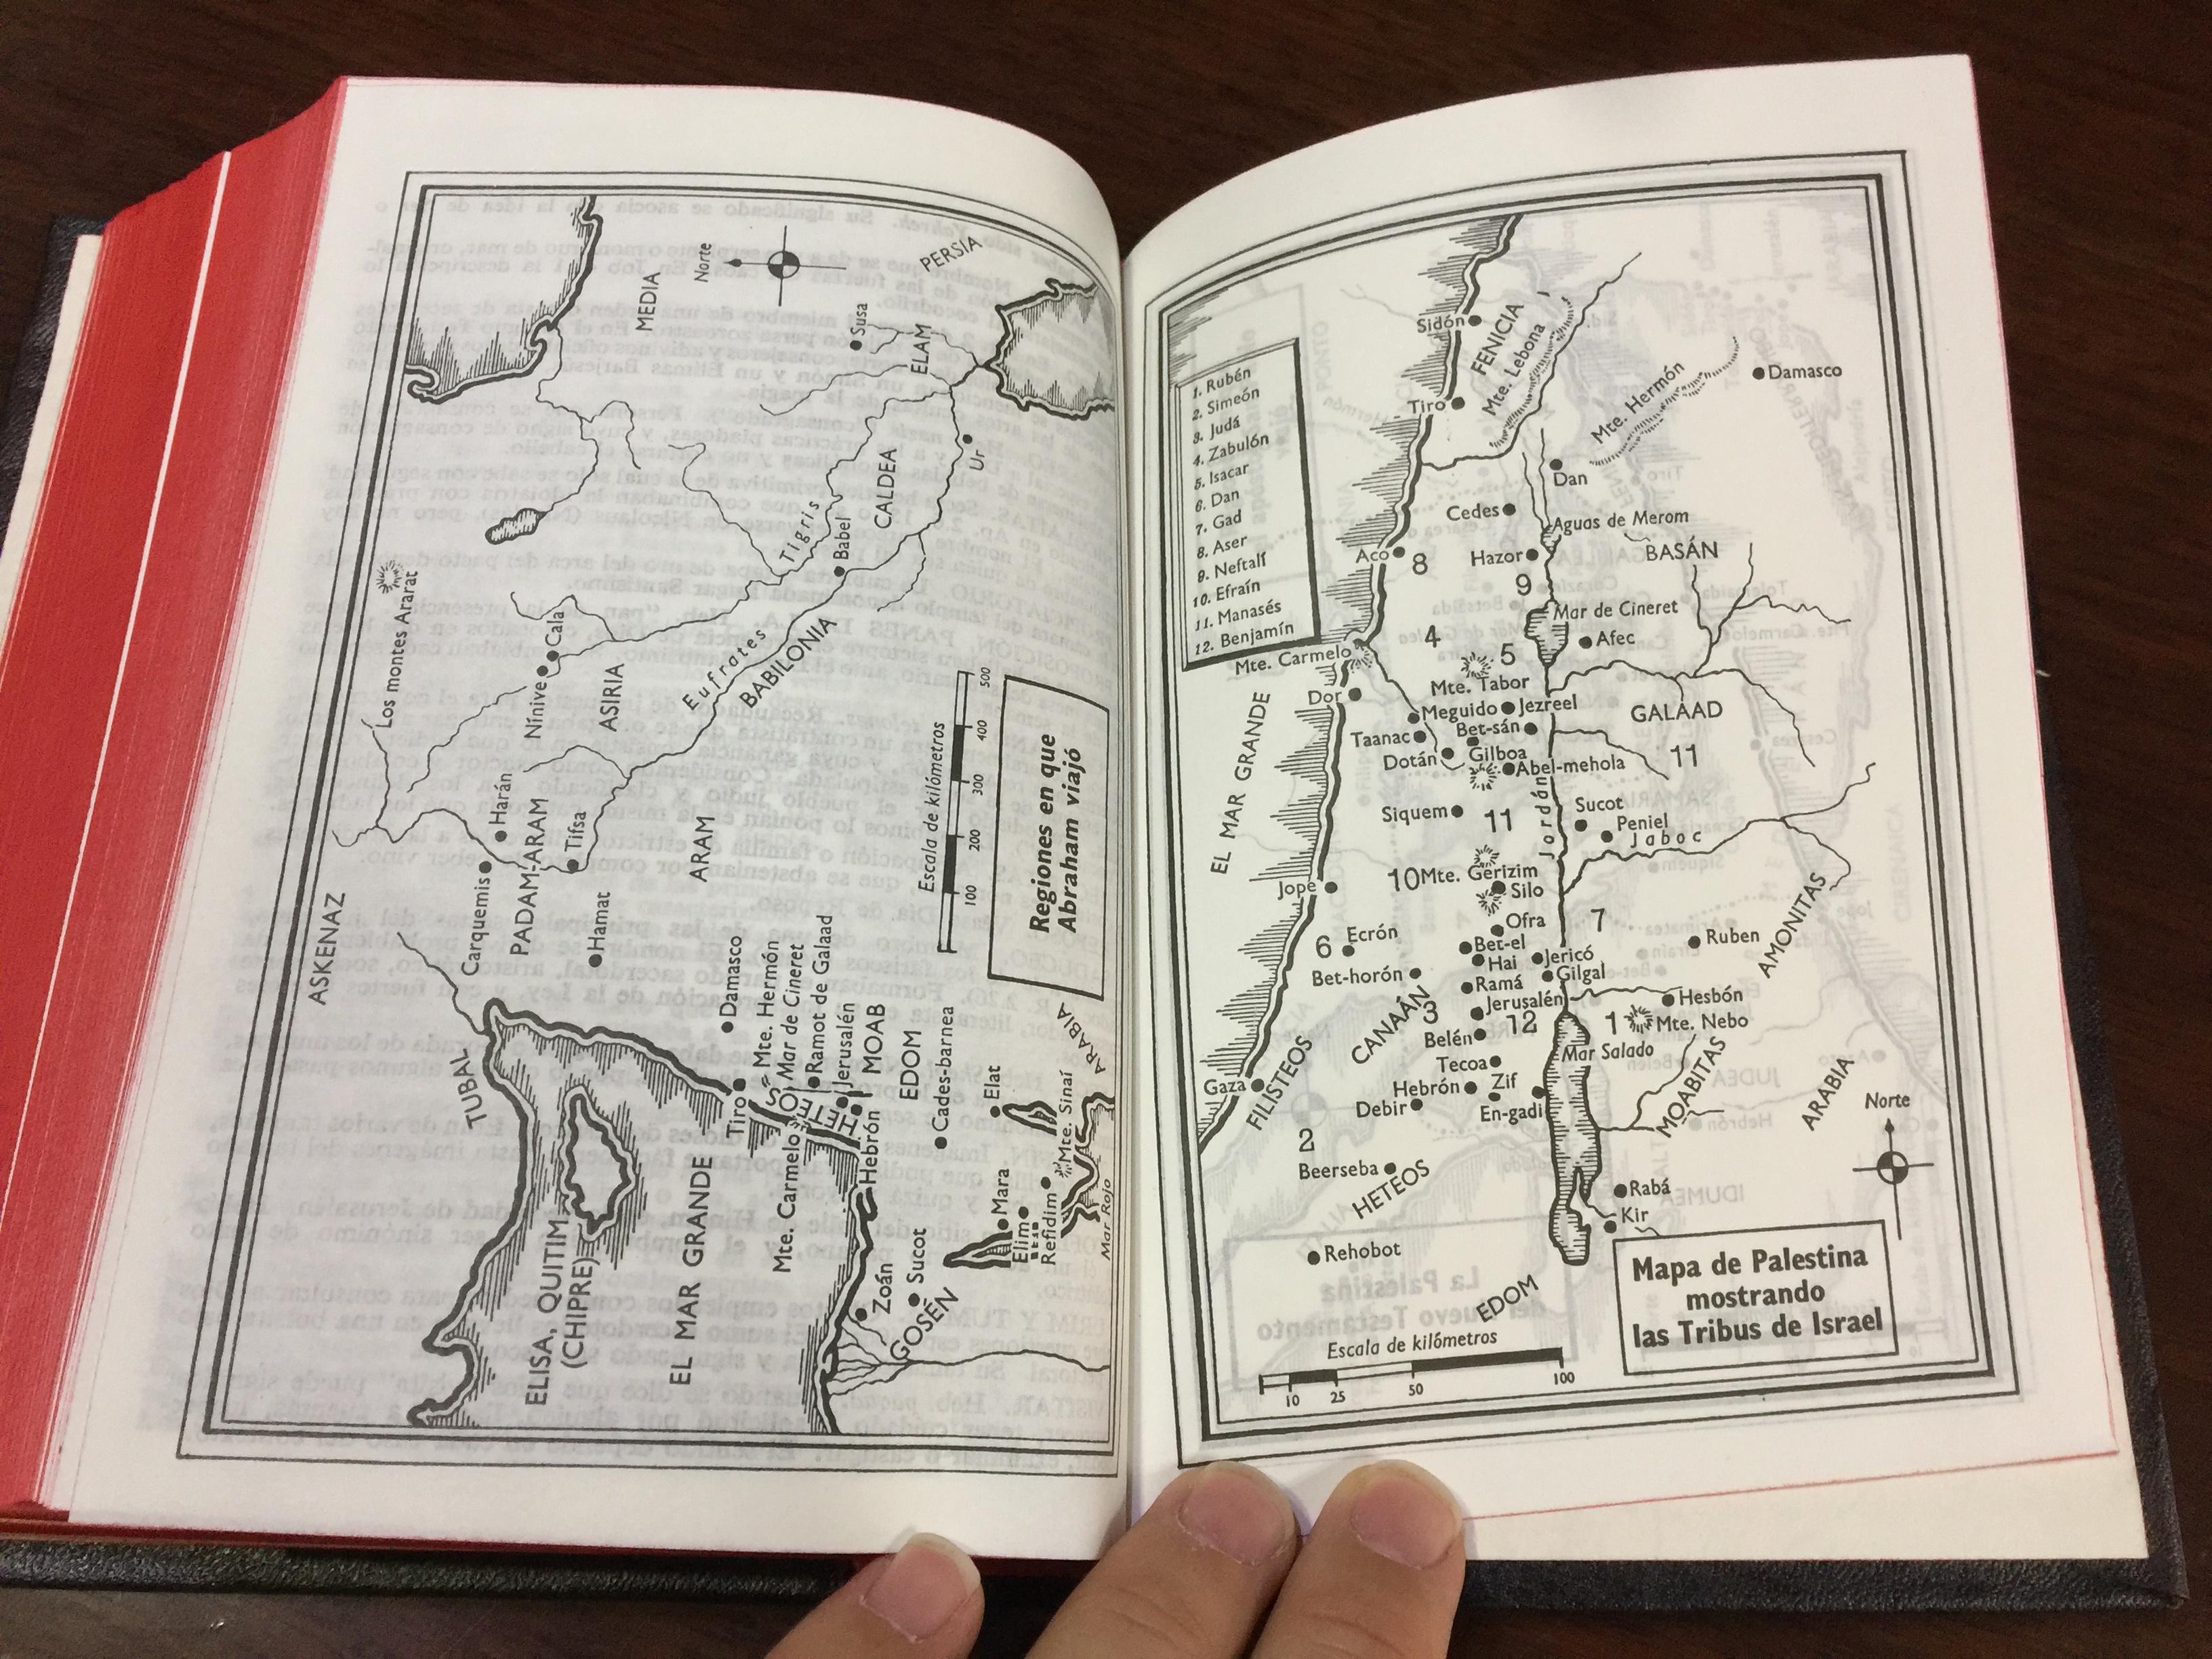 spanish-bible-la-santa-biblia-antiguo-y-nuevo-testamento-14-.jpg